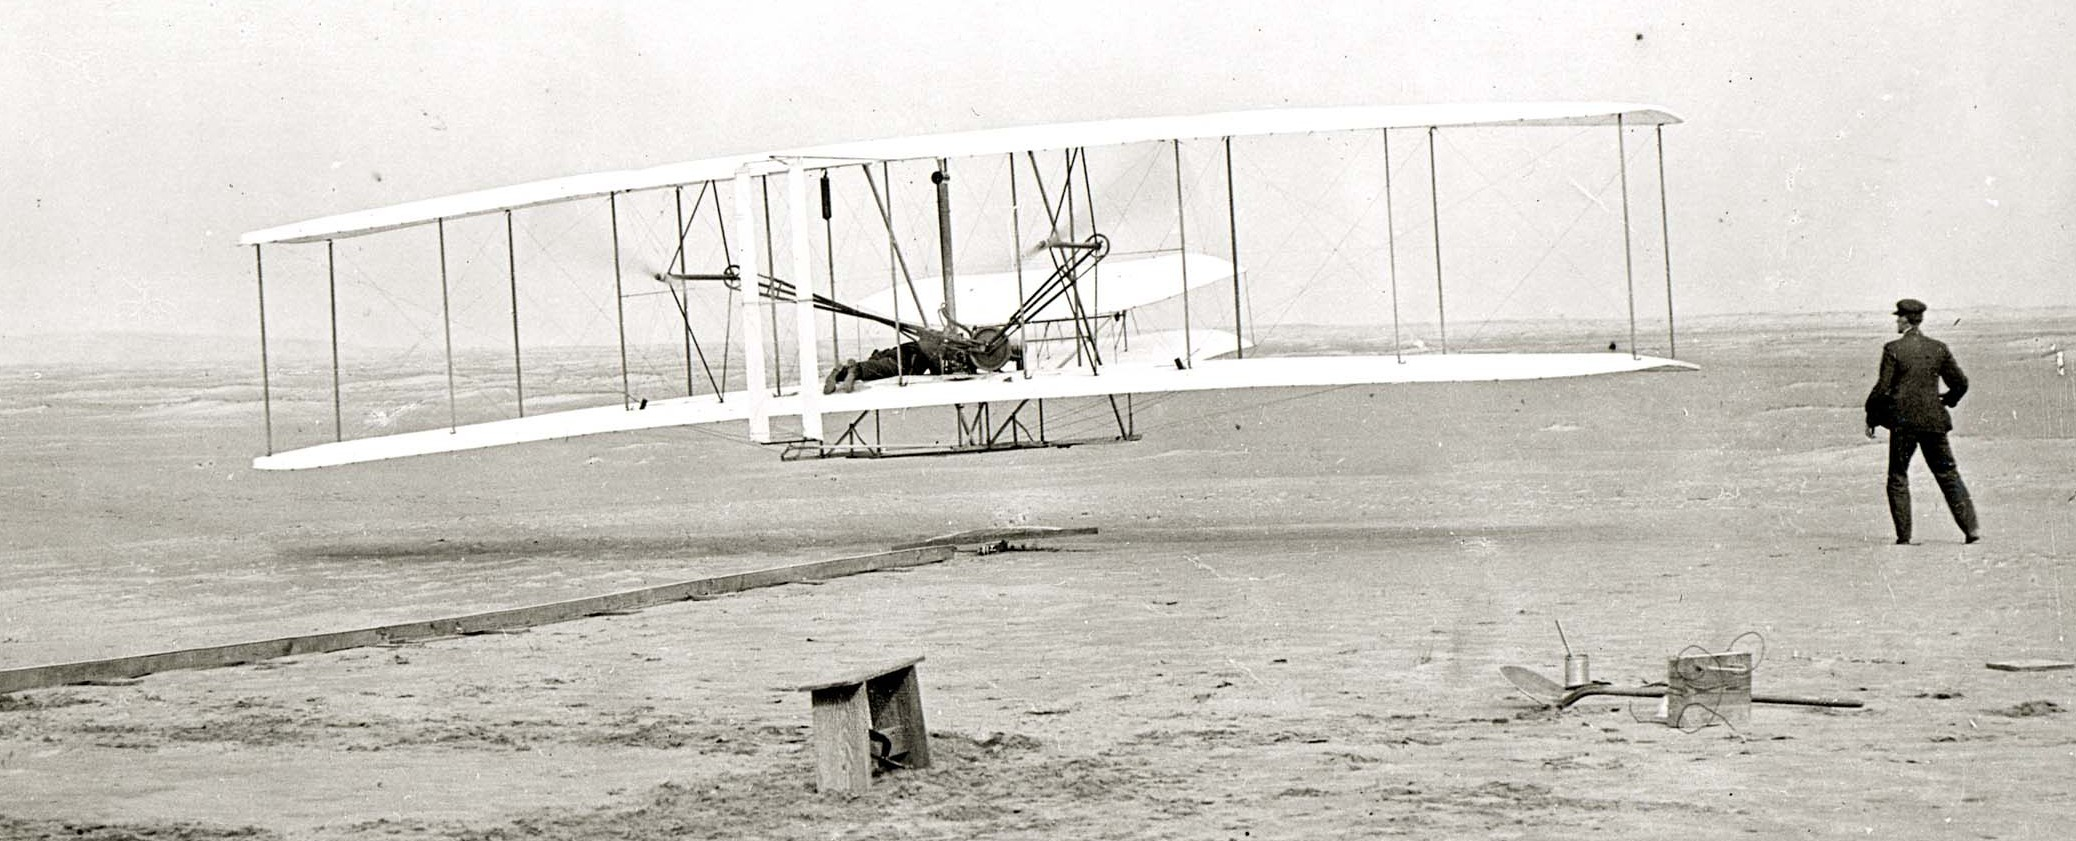 wright-kardes-ler-1903.jpg